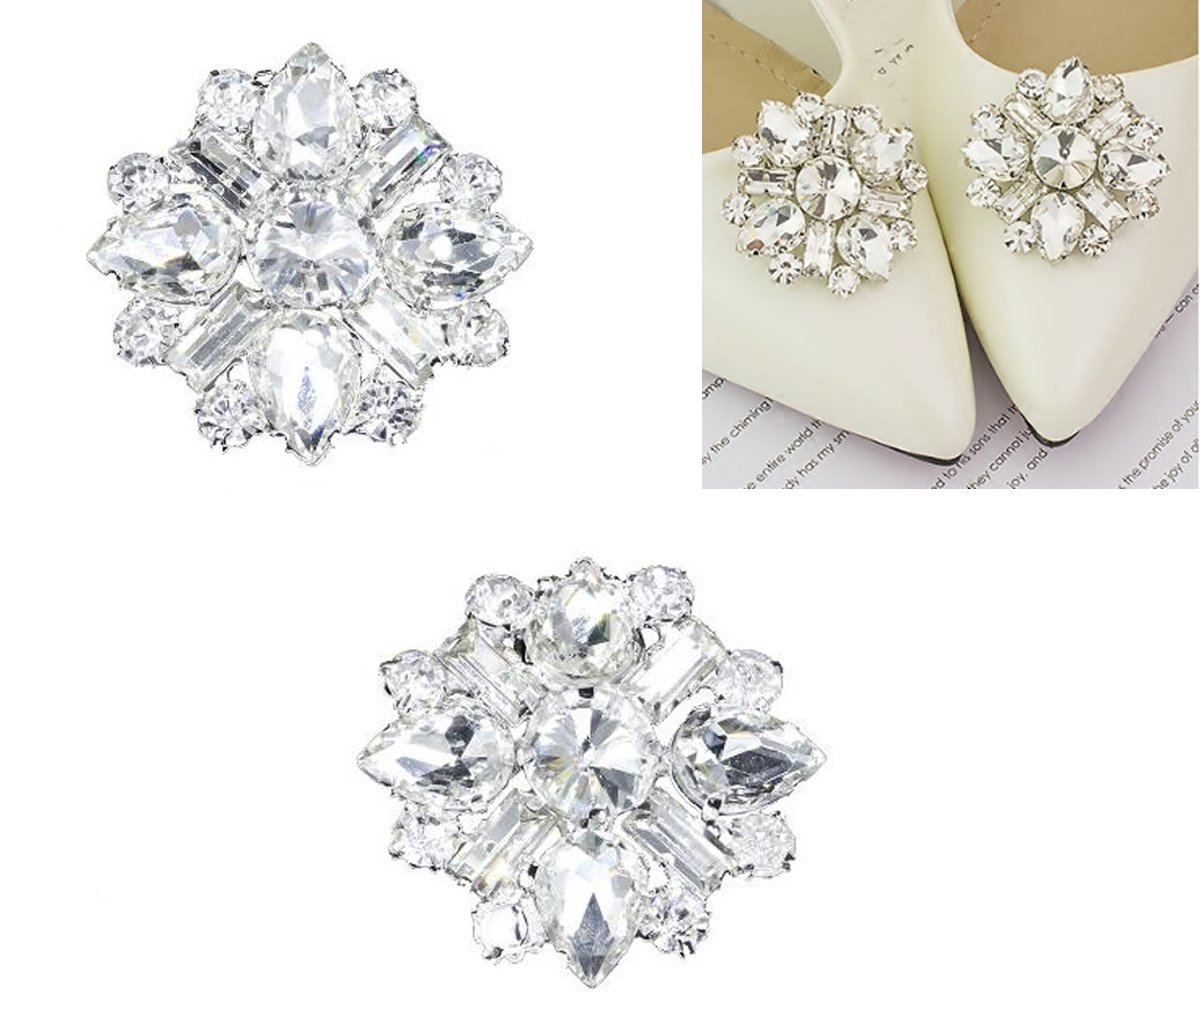 2PCS Elegant Rhinestone Crystal Shoe Clips Shoe Buckle Shoes Decoration Charms for Women Girls Party Bridal Wedding (D#)